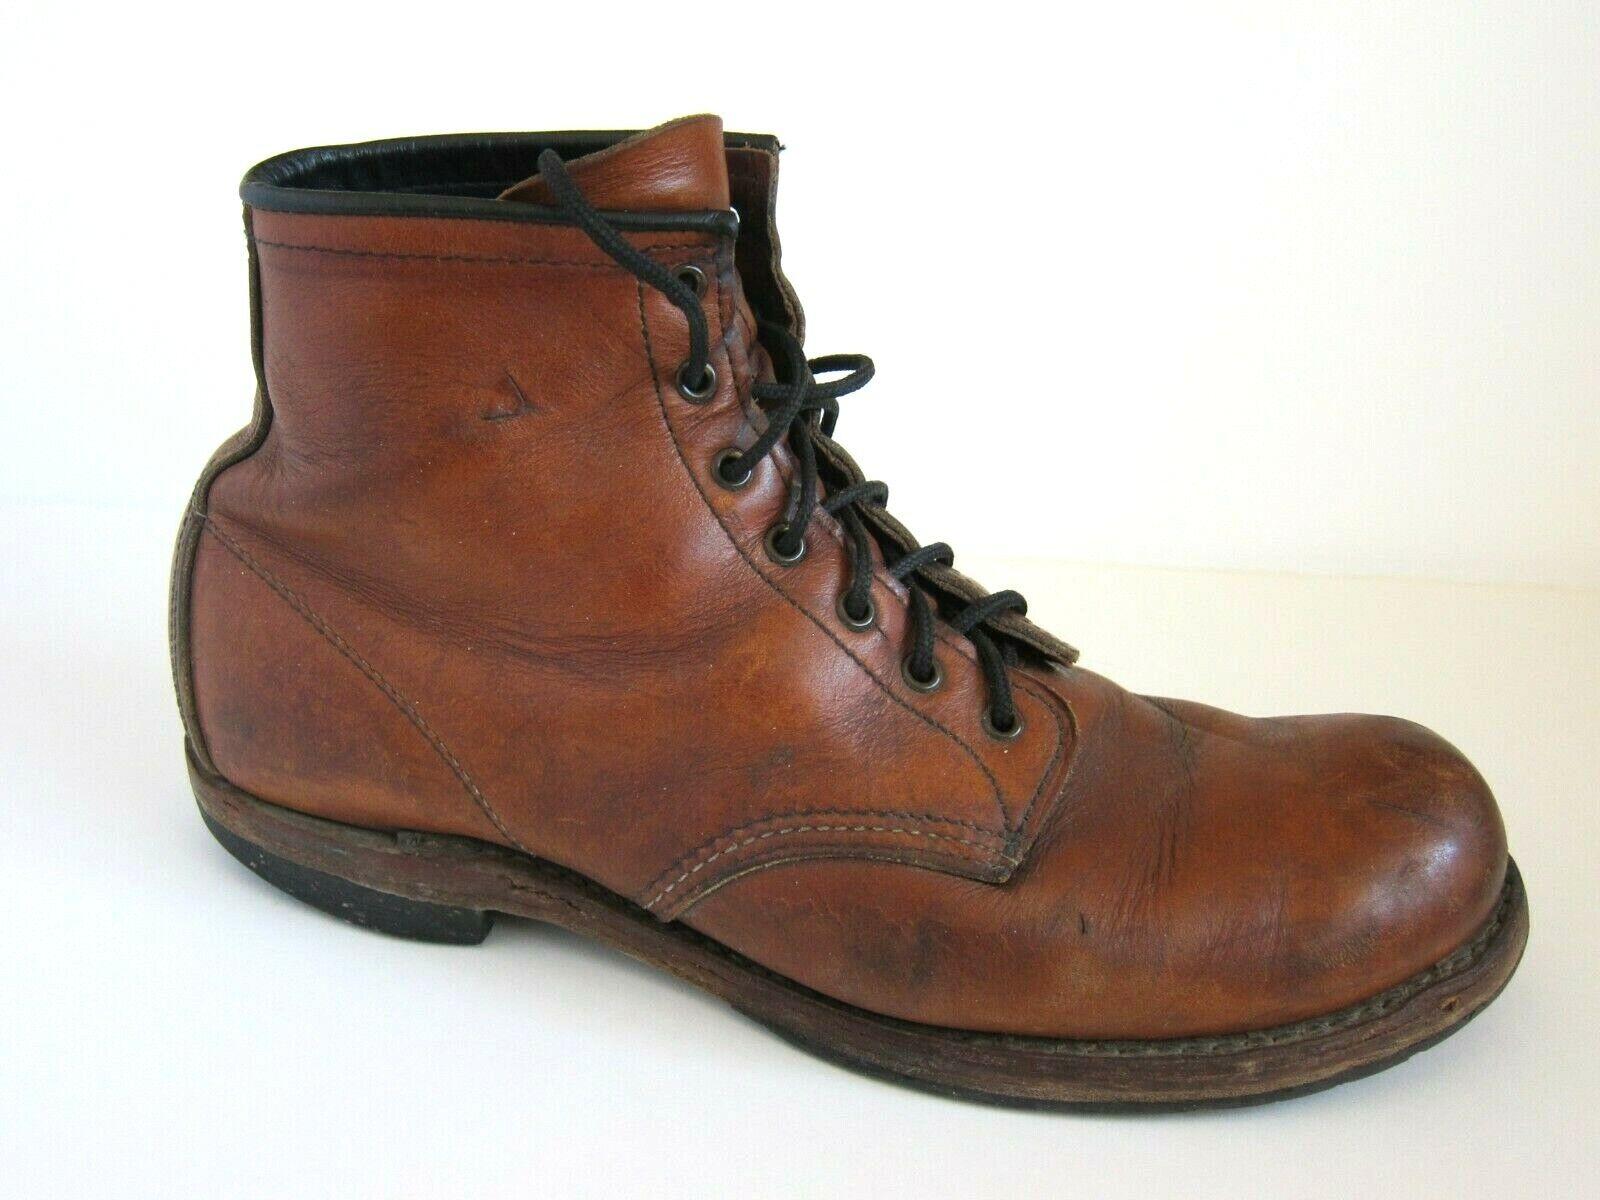 rojo Wing Heritage 9016 Beckman cigarro marrón botas para hombre 11 D 11D